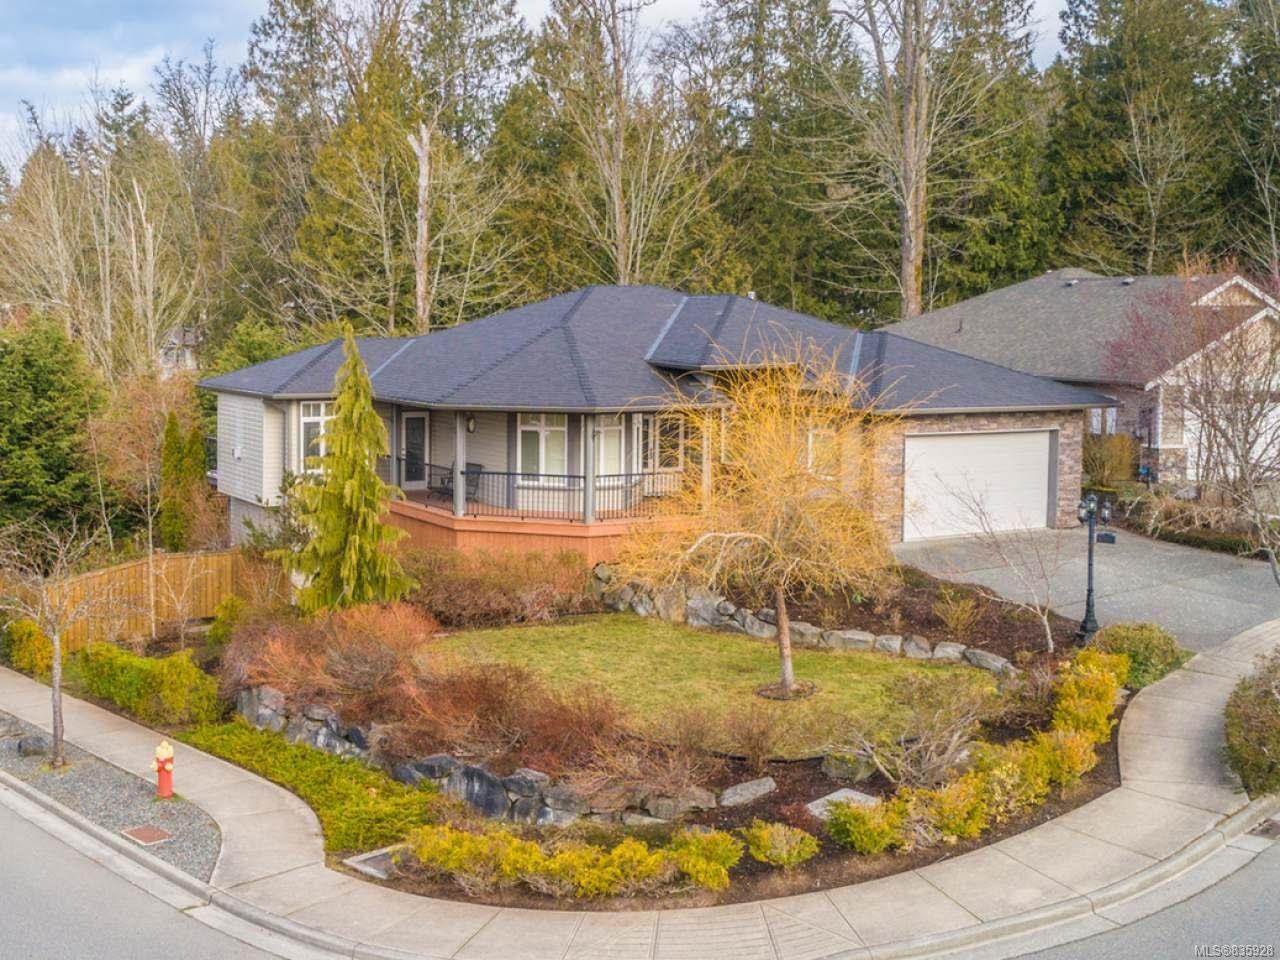 Main Photo: 3337 Willowmere Cres in NANAIMO: Na North Jingle Pot House for sale (Nanaimo)  : MLS®# 835928